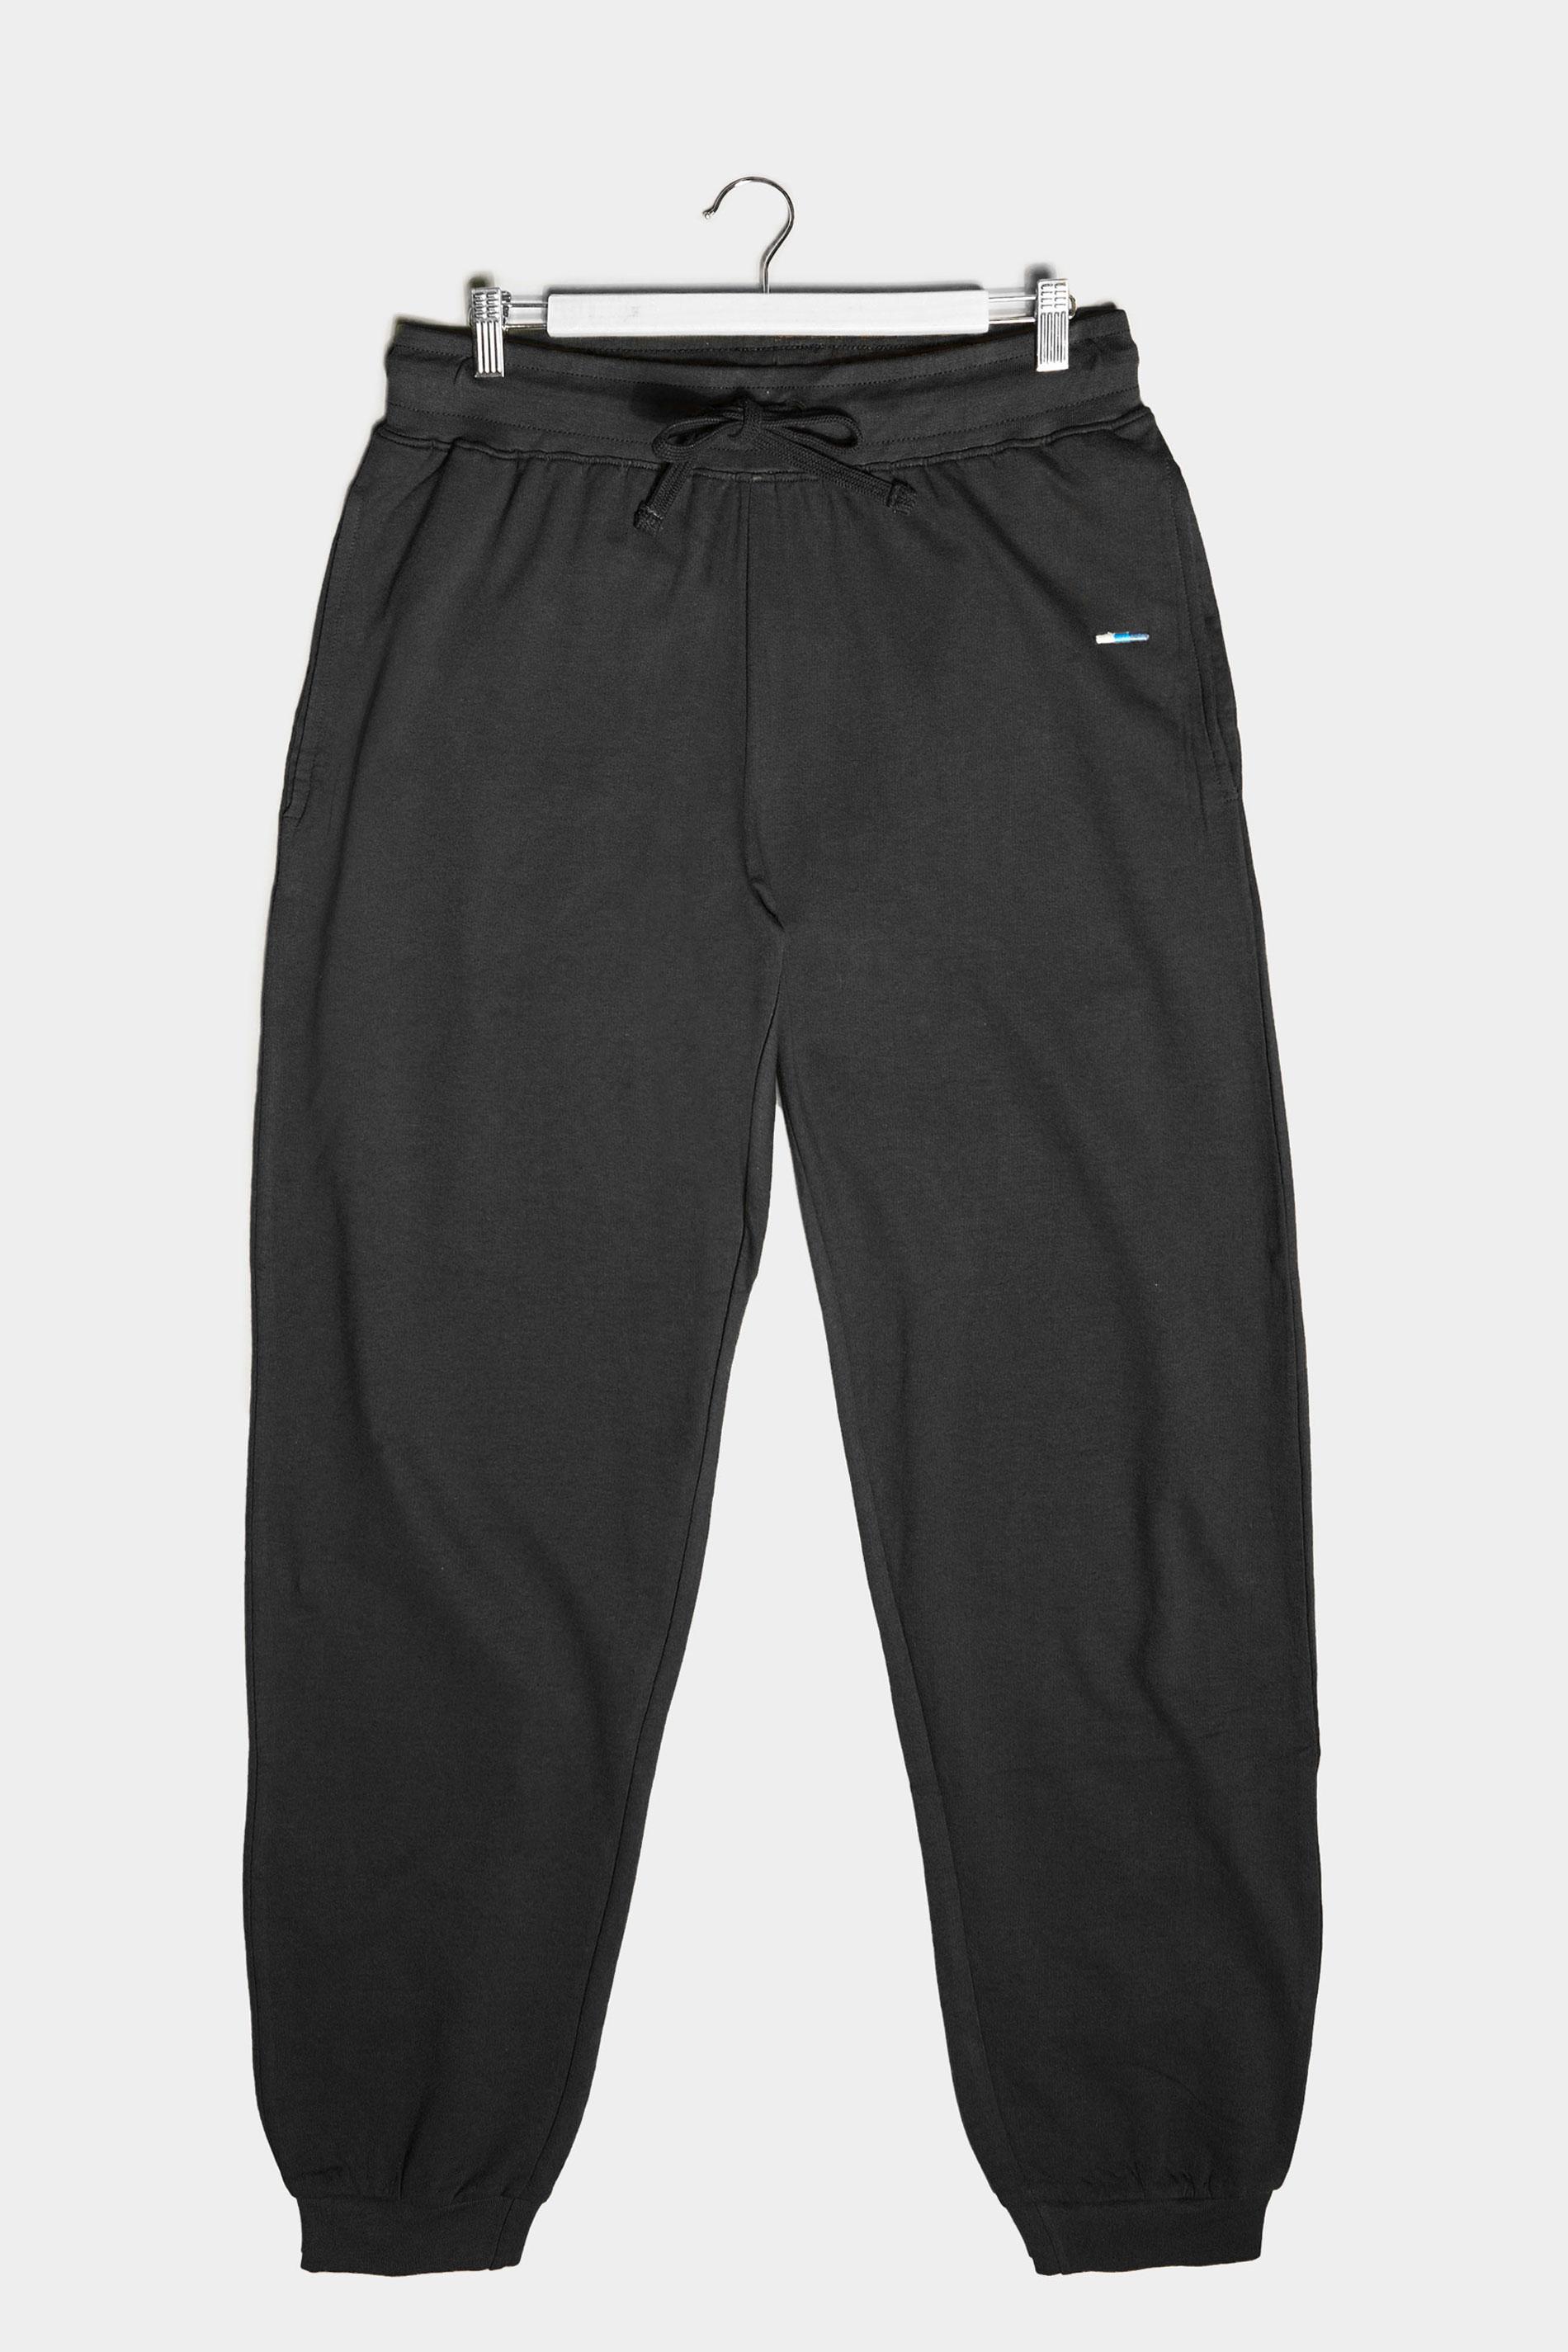 BadRhino Black Essential Joggers